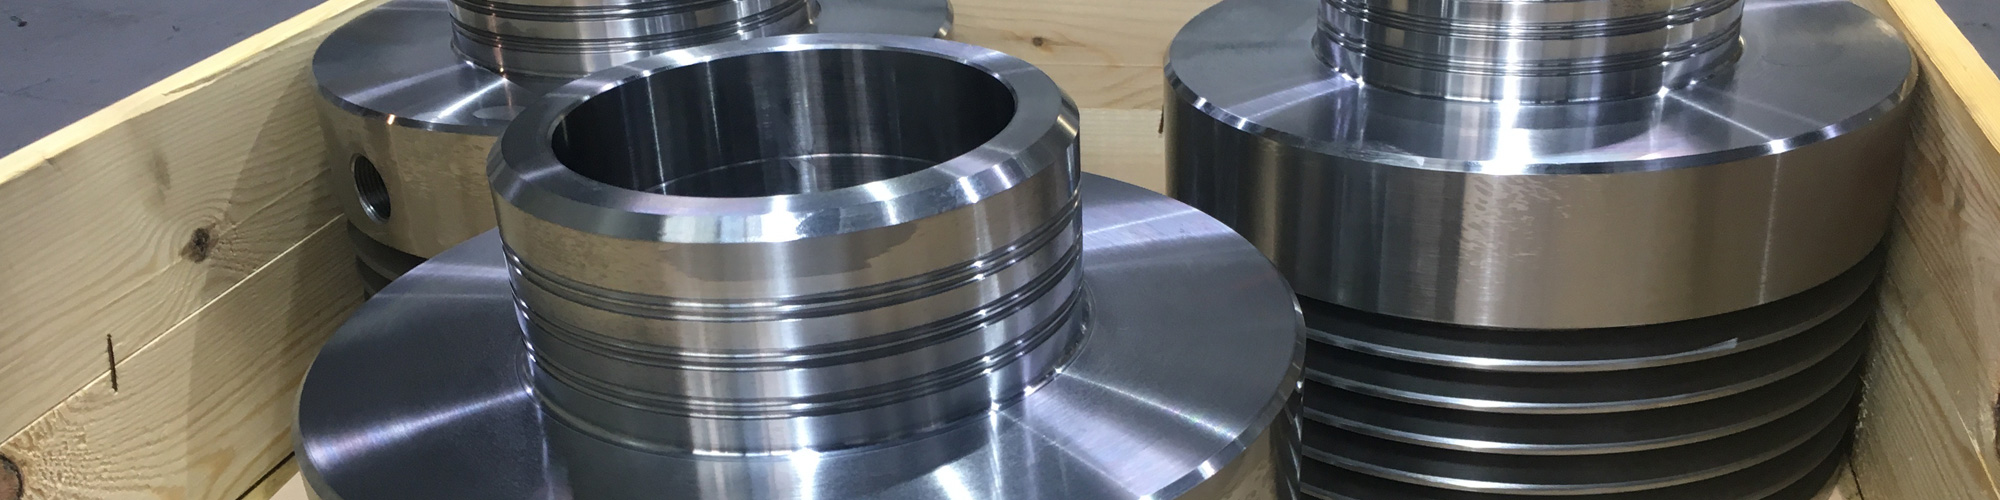 Geukes GmbH - Maschinenbau - Sonderteile Drehen